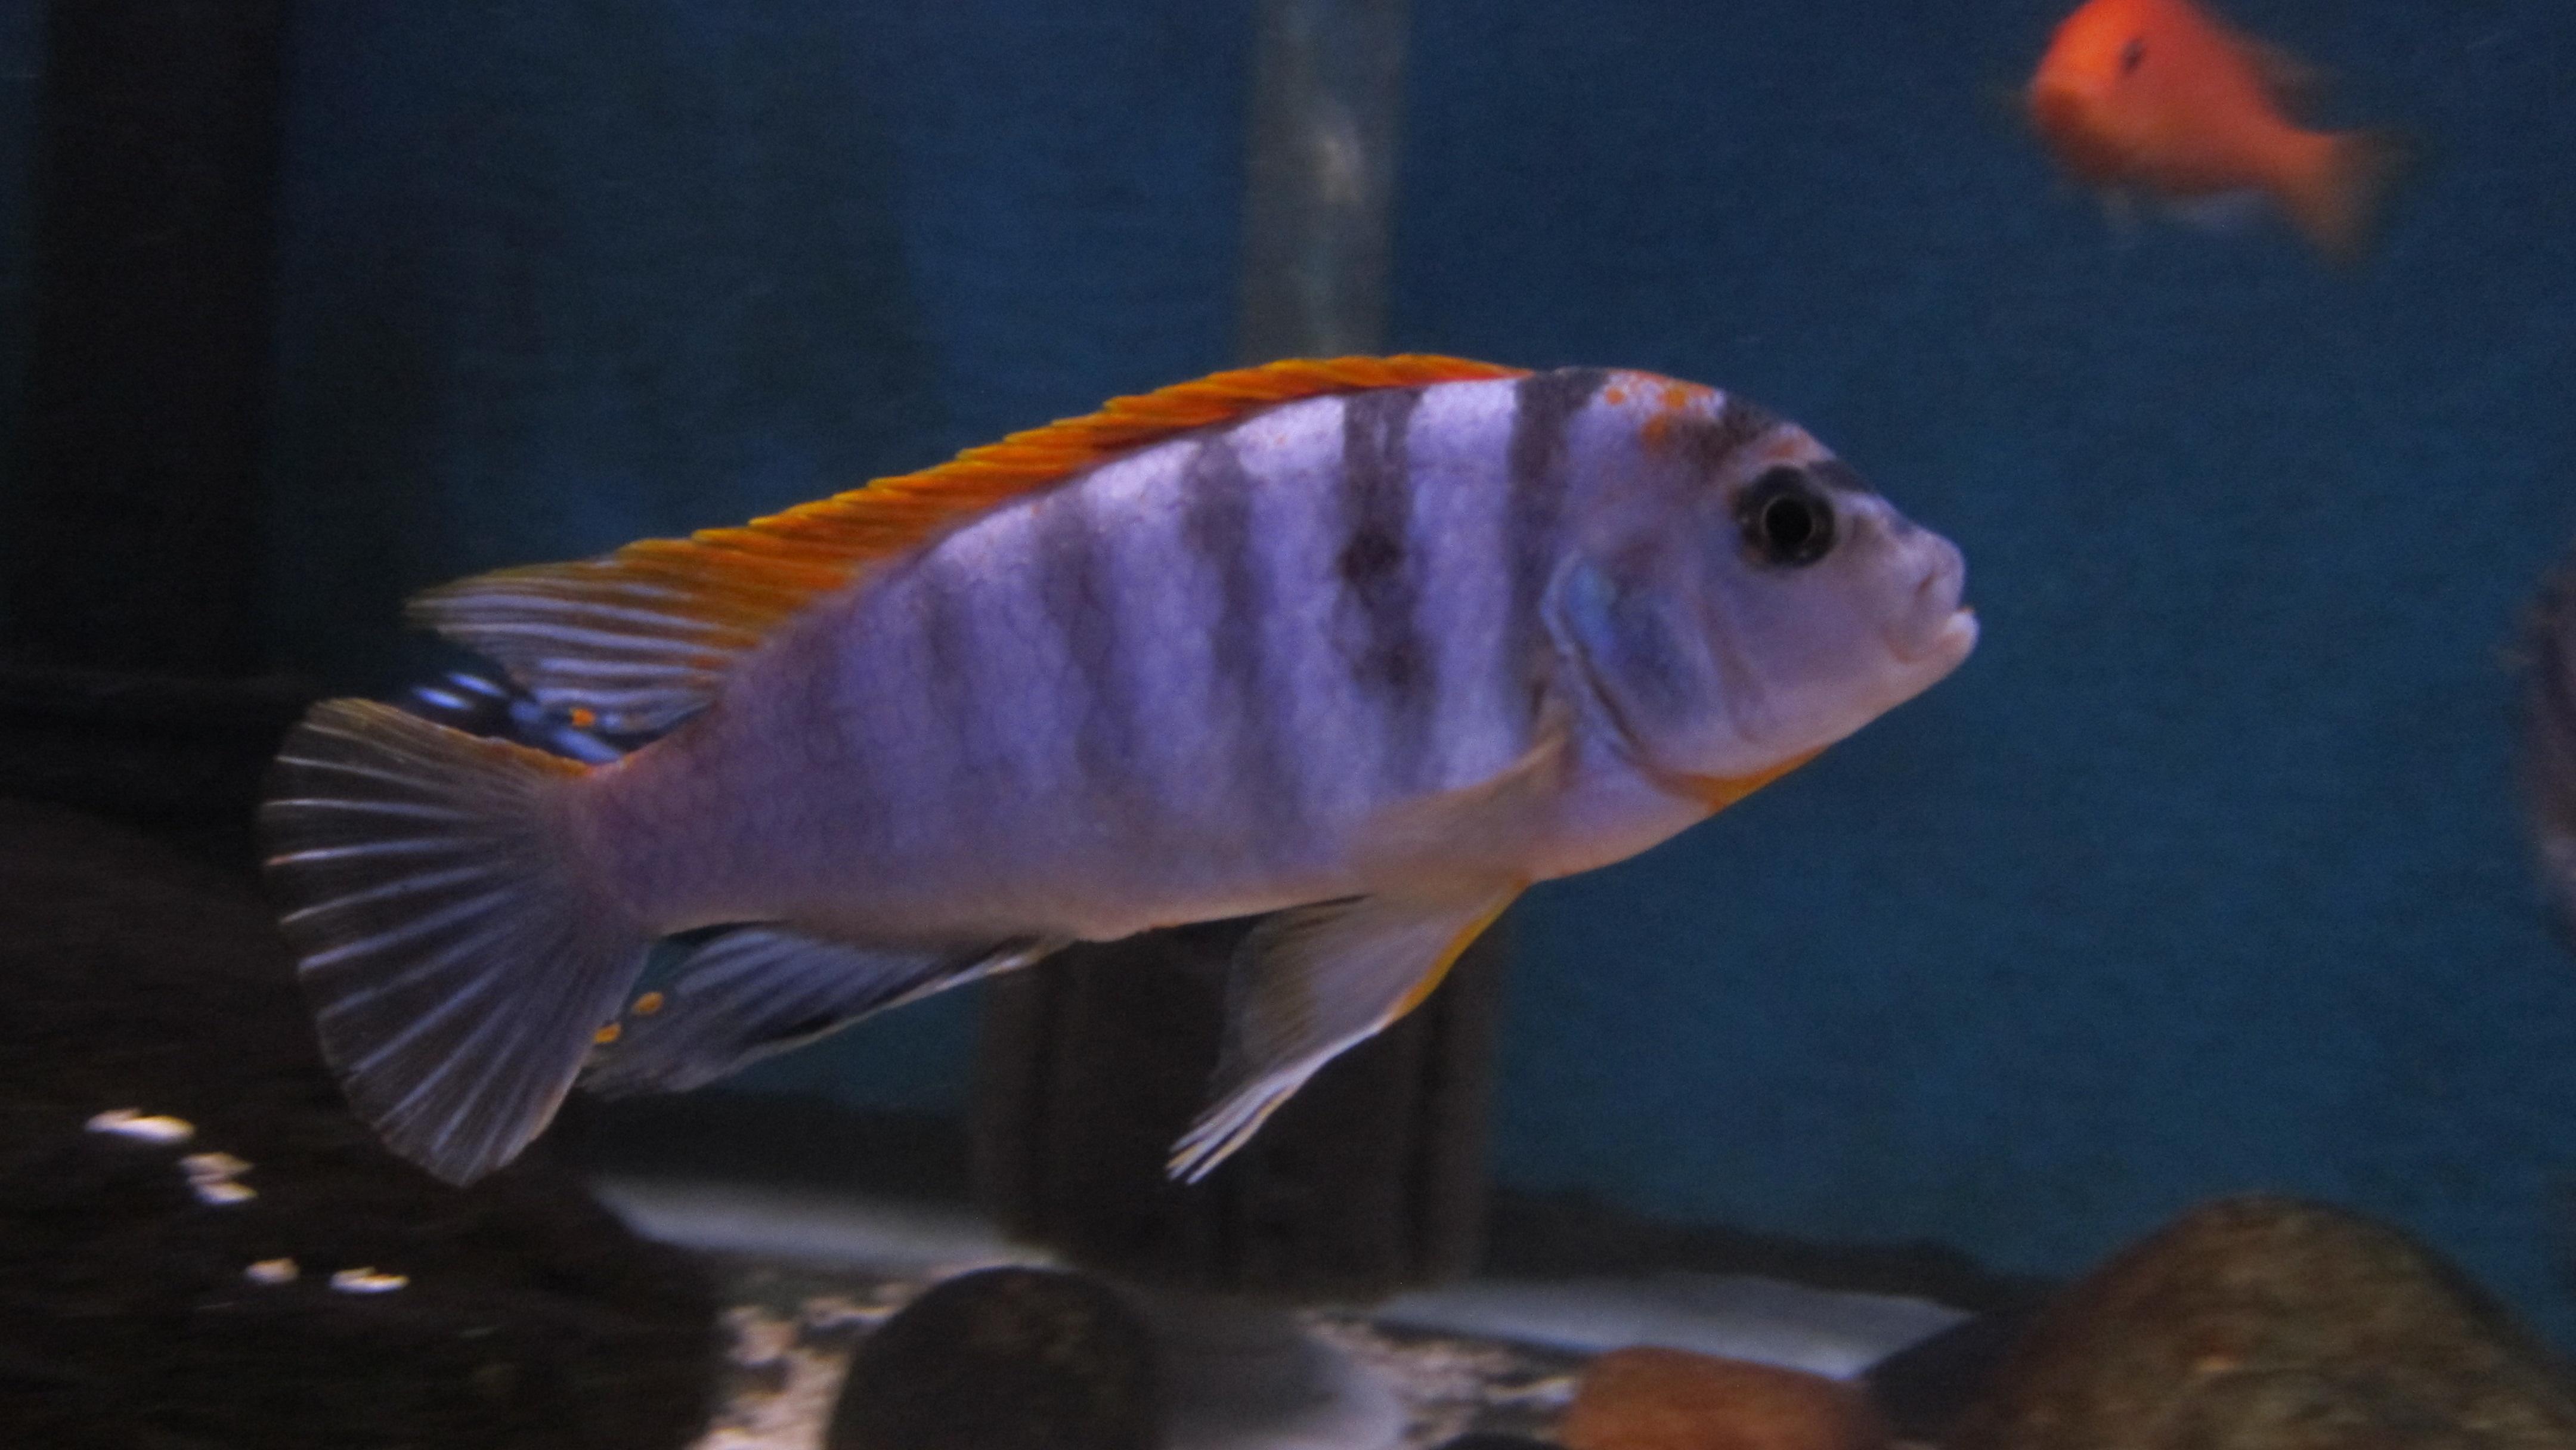 cichlids.com: Labidochromis sp.